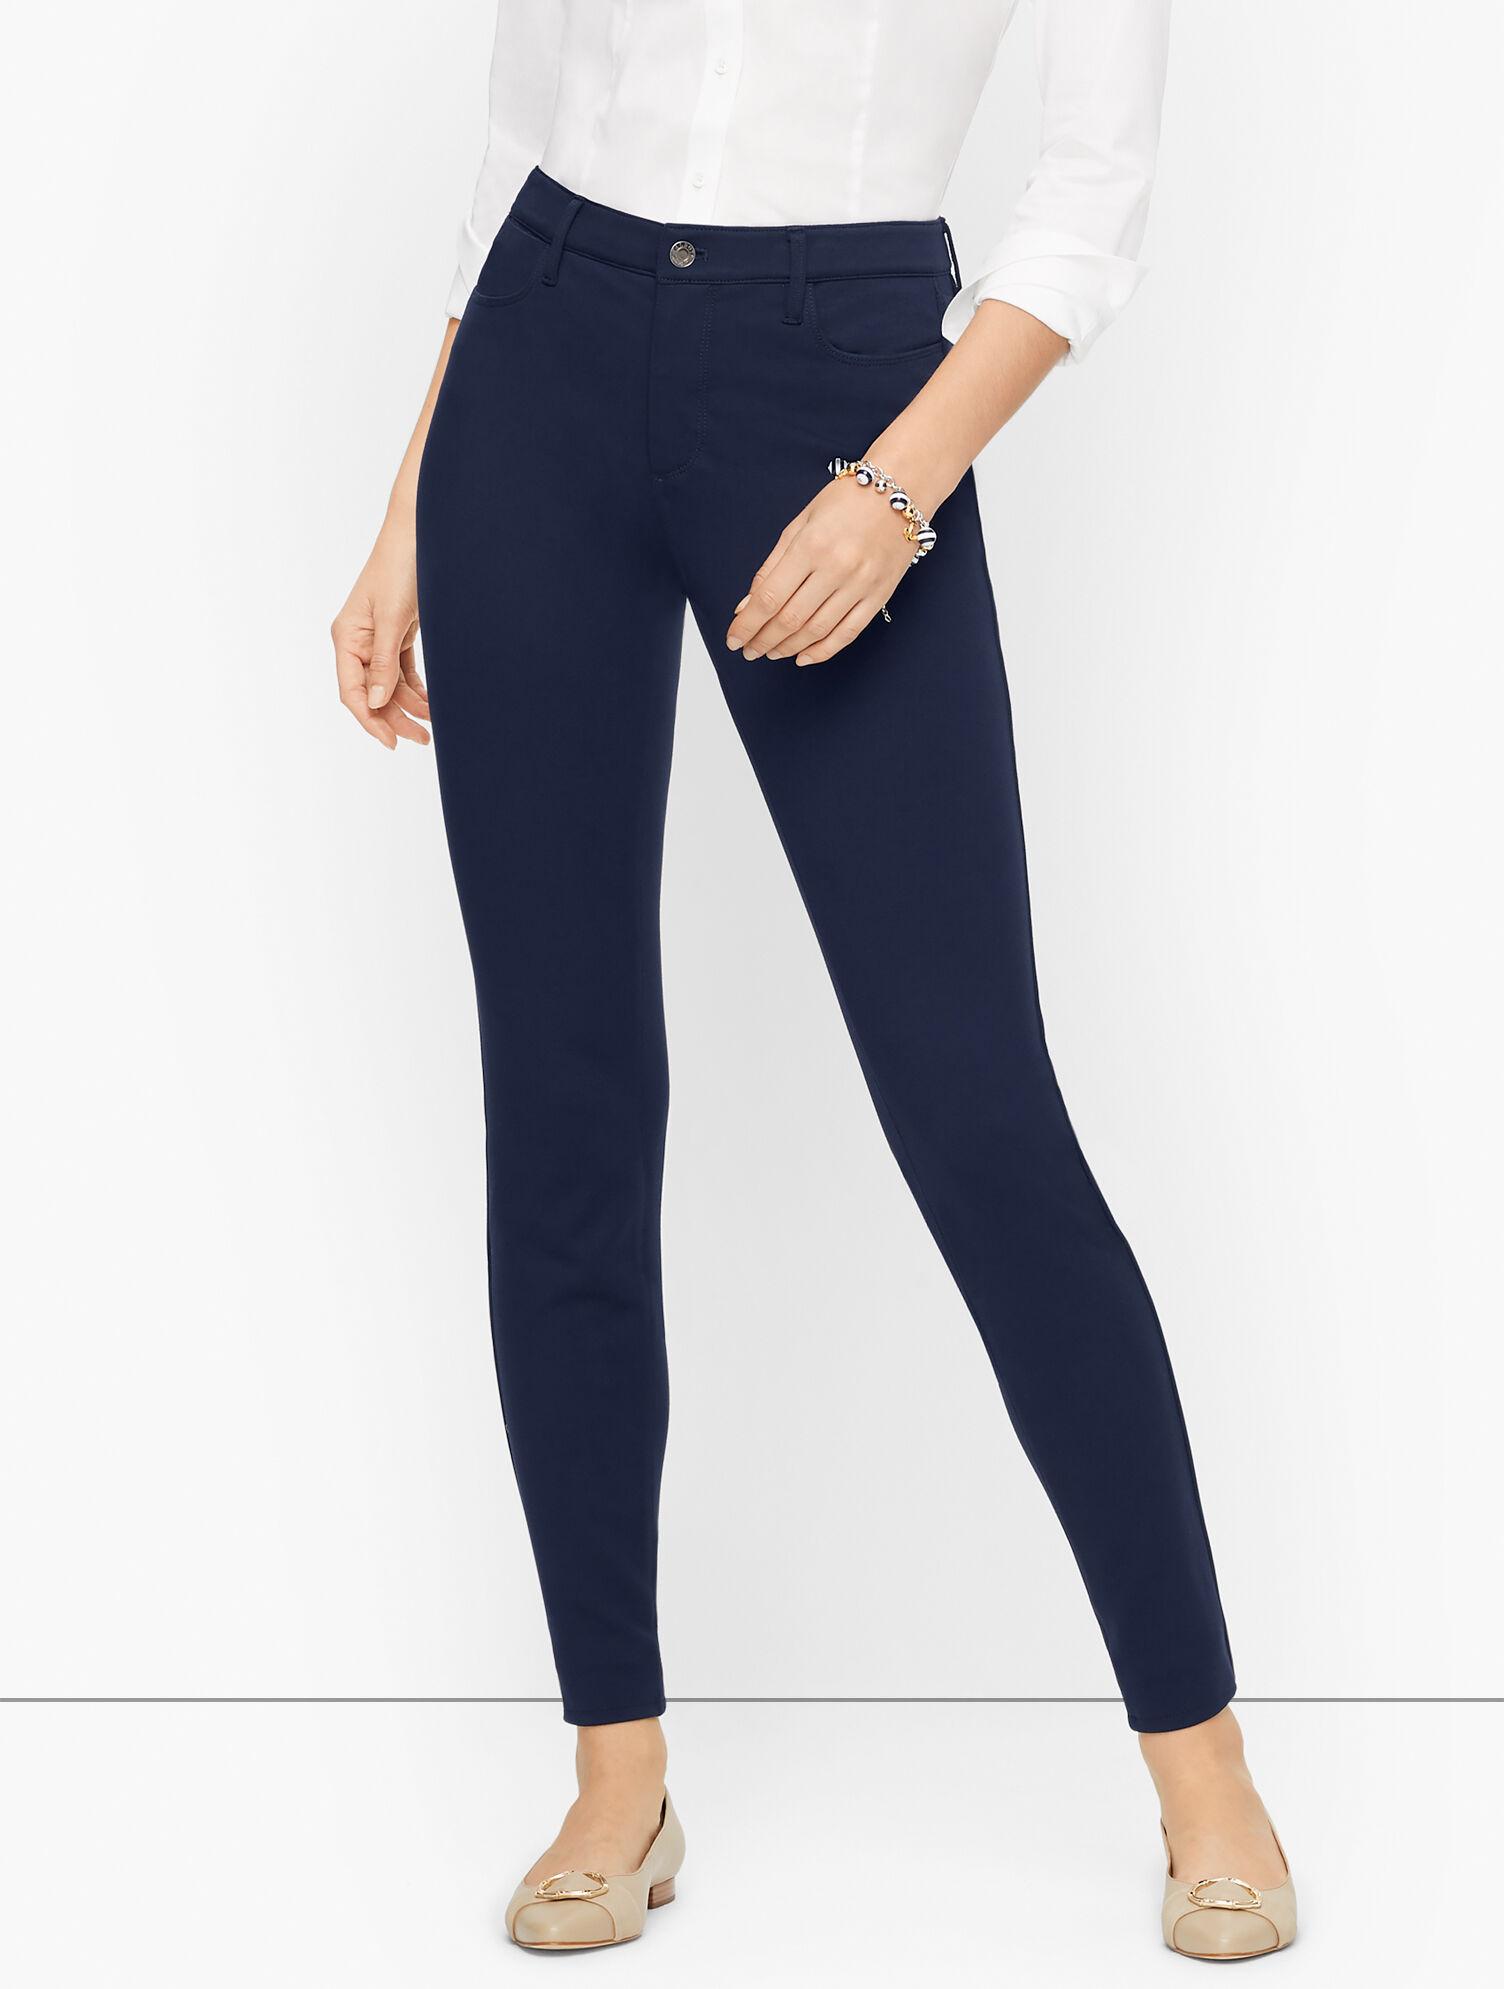 Talbots Ponte Jegging Pants - Blue - 2 Talbots  - Blue - Size: female - Size: 2